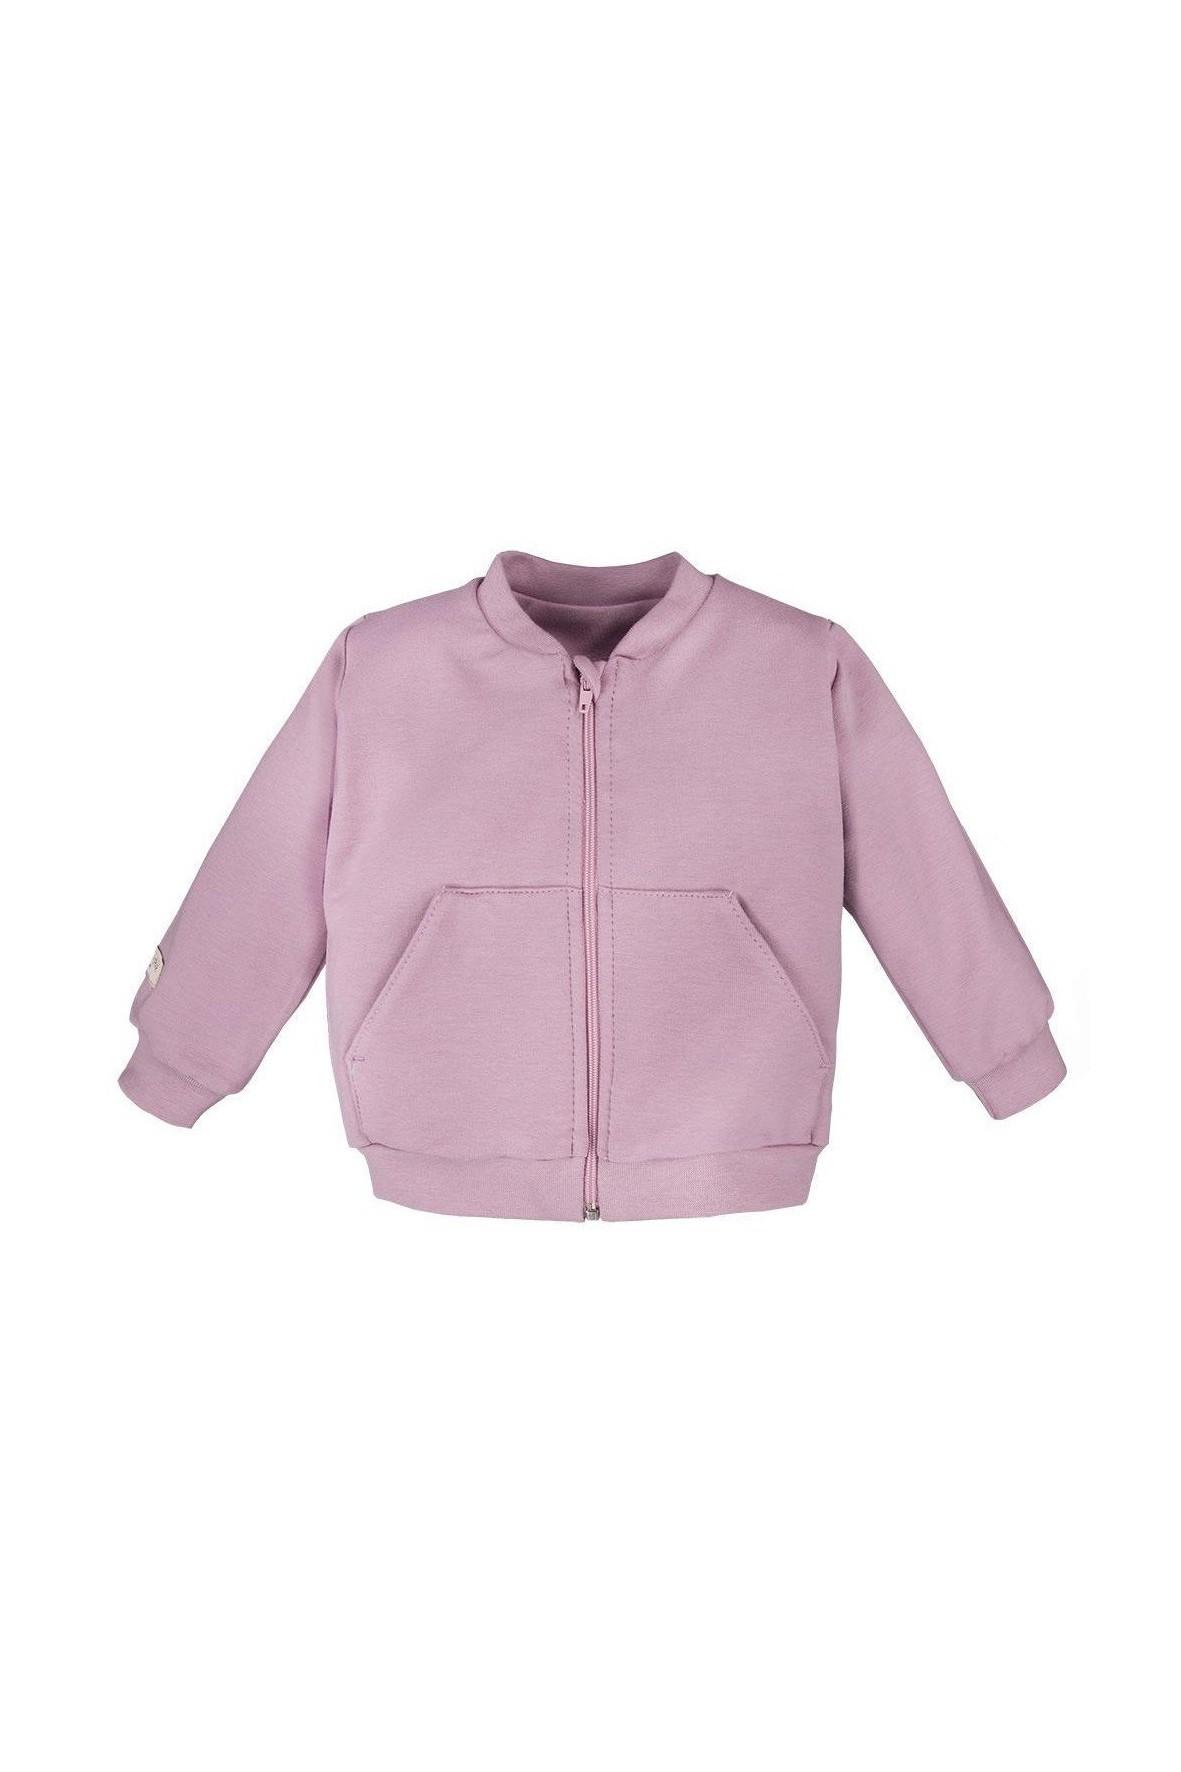 Bawełniana bluza bomberka - wrzosowa